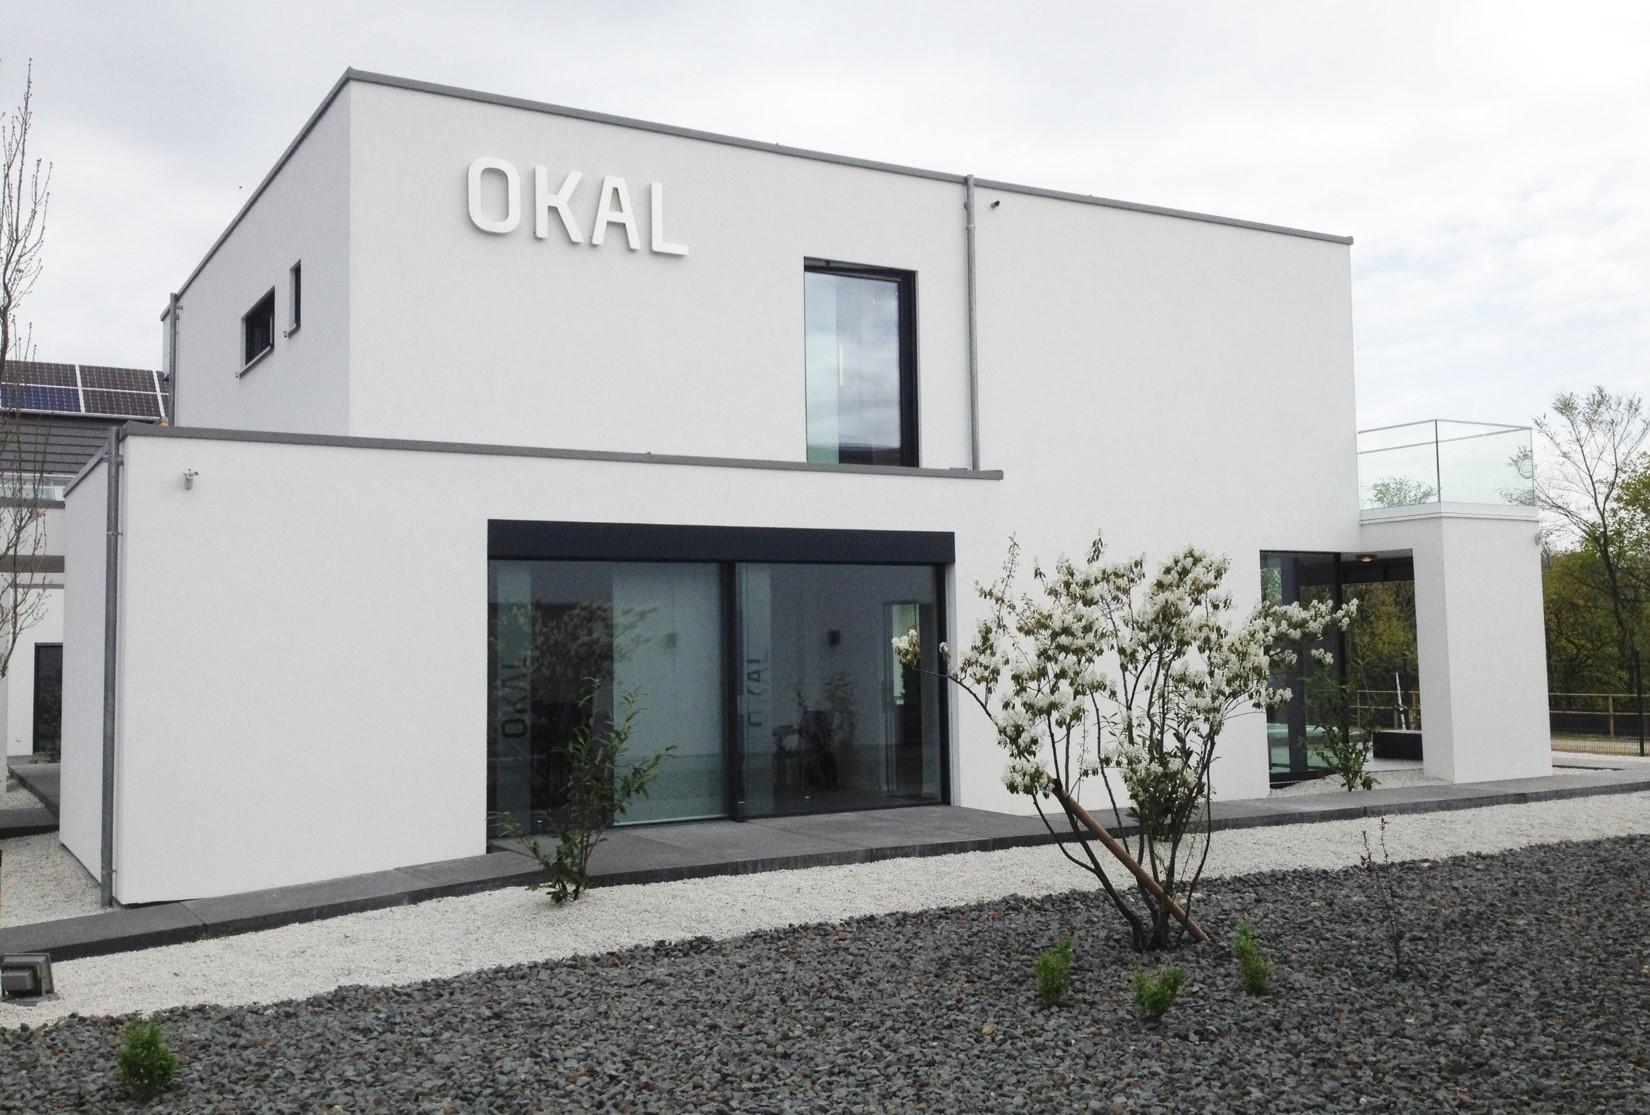 villa im bauhausstil f r okal metall und glas. Black Bedroom Furniture Sets. Home Design Ideas